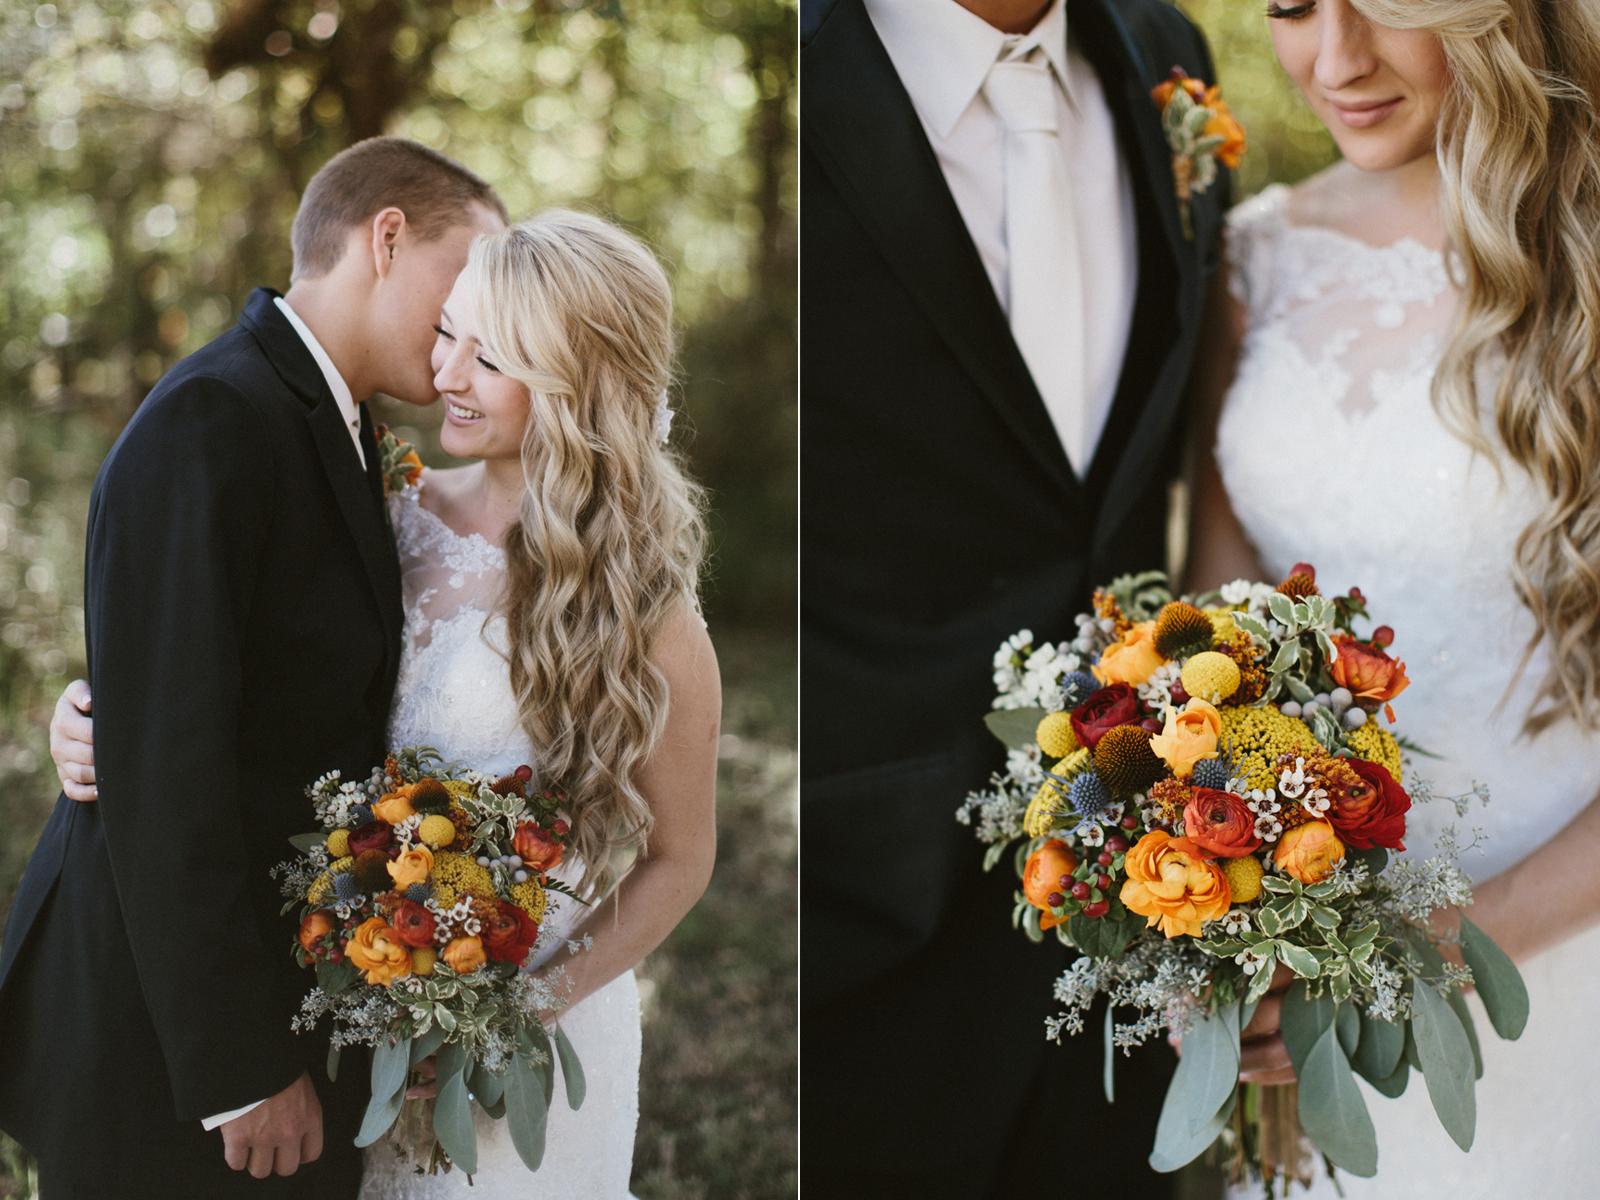 SiouxFalls_DesMoines_Wedding_Photographer_26.jpg